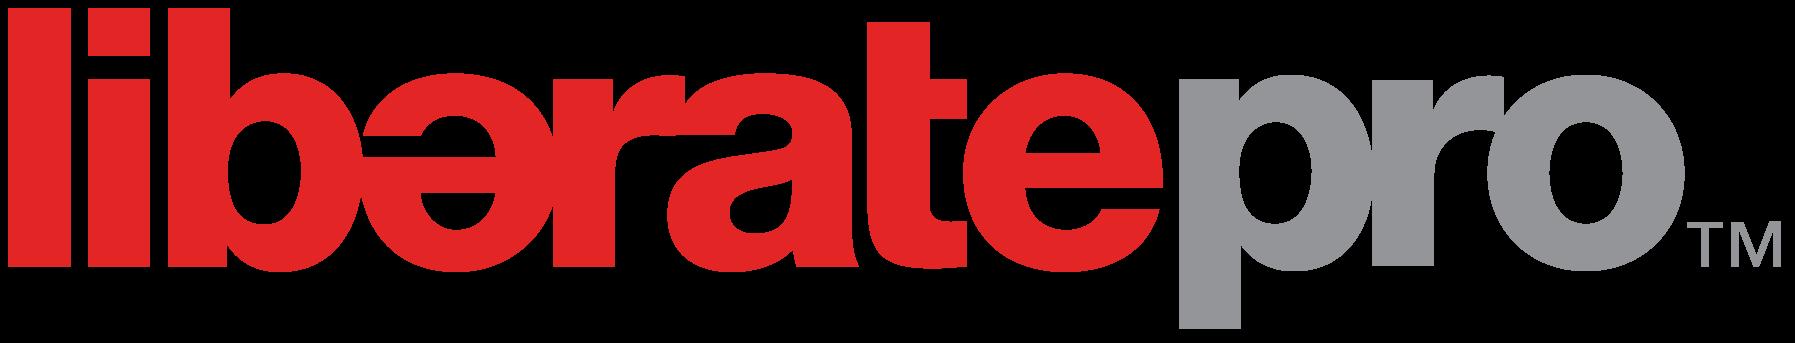 Liberate Pro UK logo image